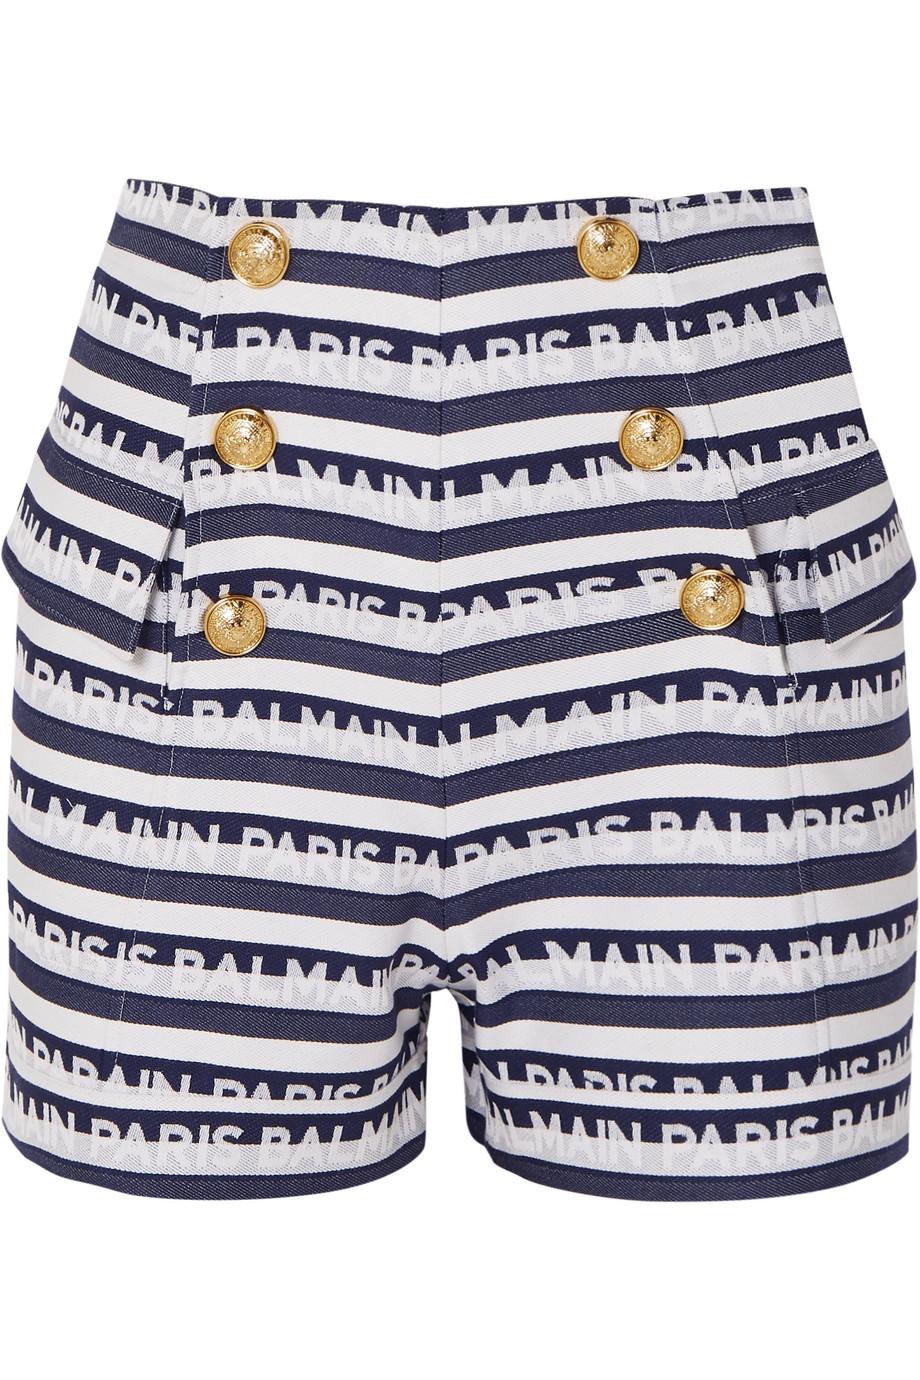 Balmain Button-embellished striped cotton-twill shorts